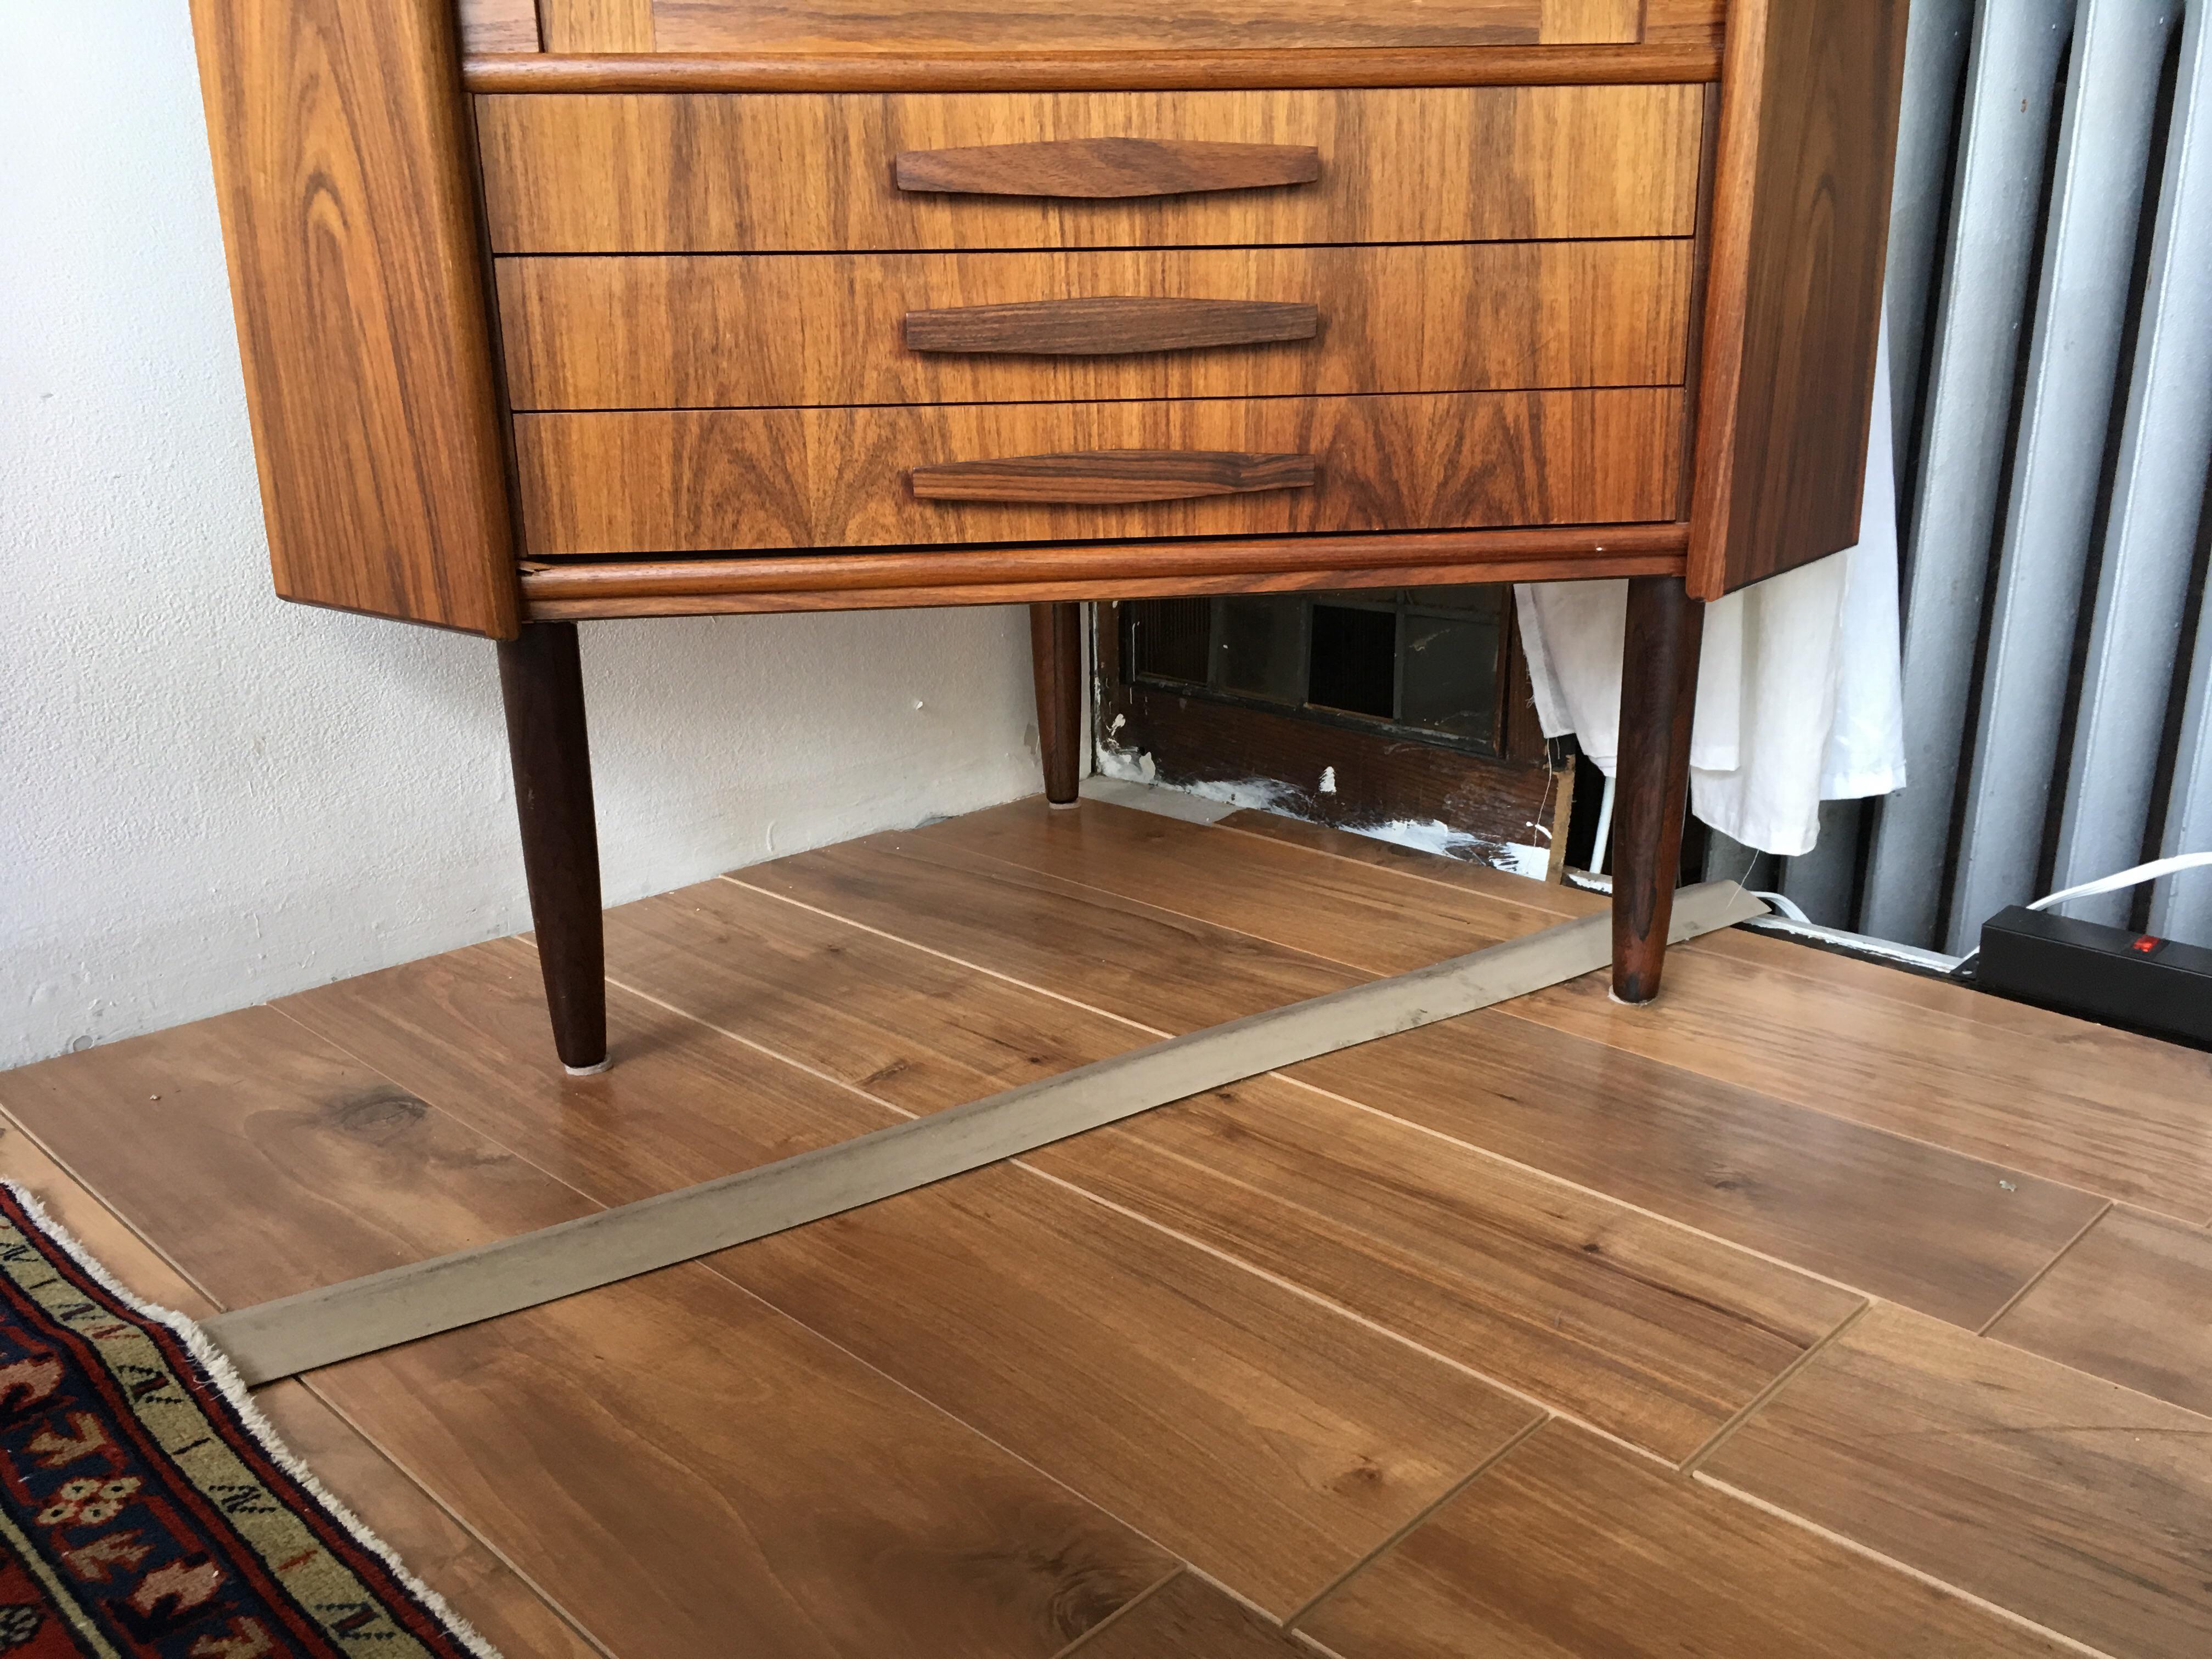 Beautiful Corner Cabinet In Teak, Unmarked Danish Design But Itu0027s Too  Lovely To Matter Too